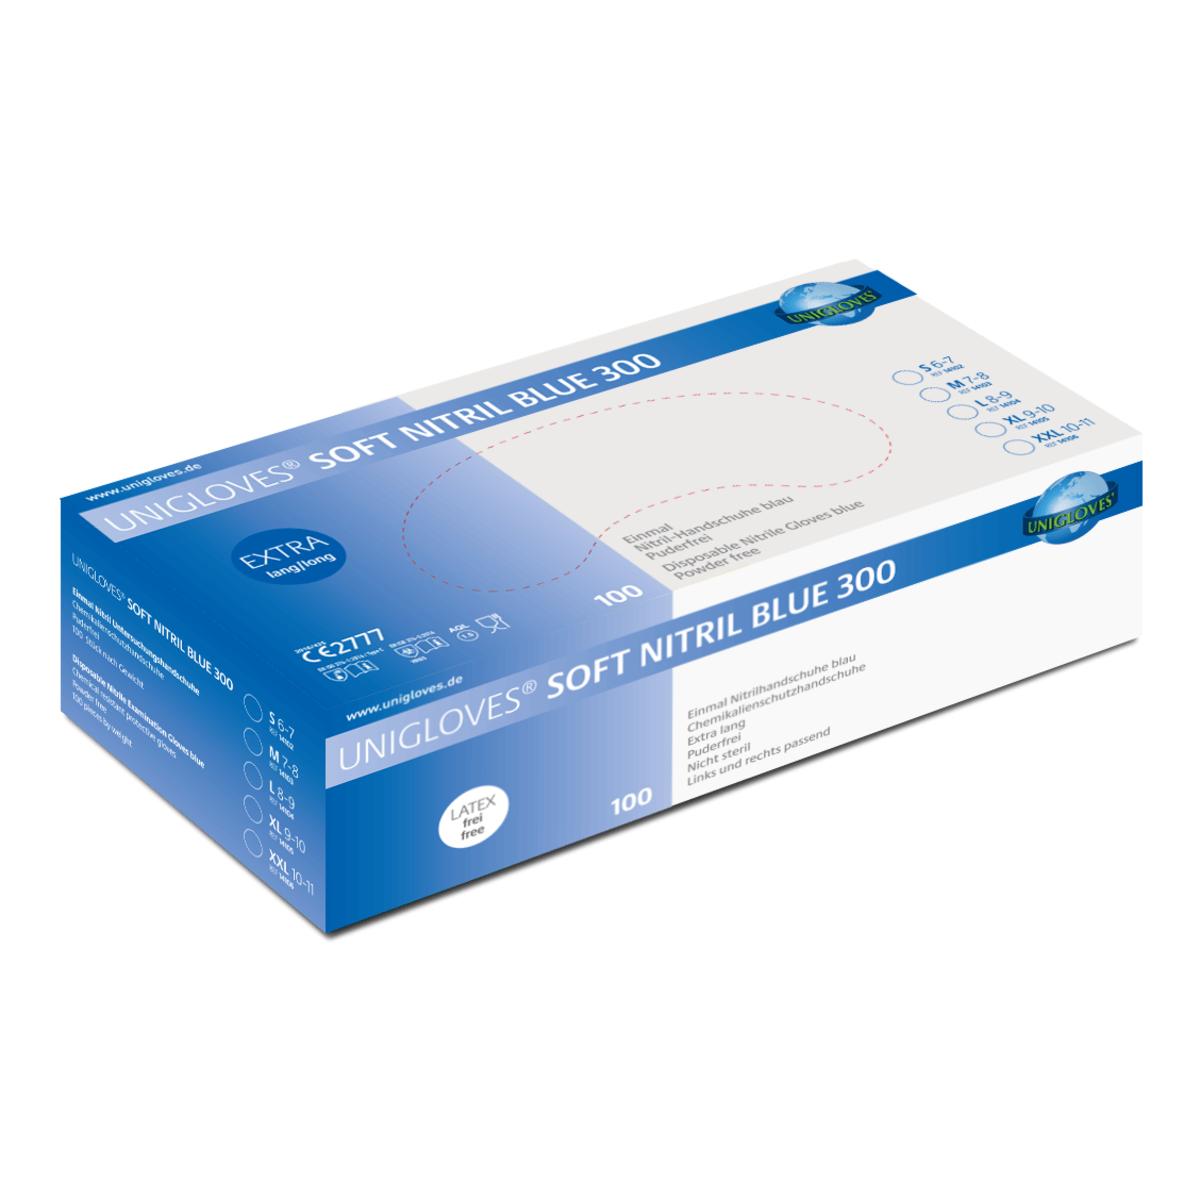 Unigloves Soft Nitril Blue 300